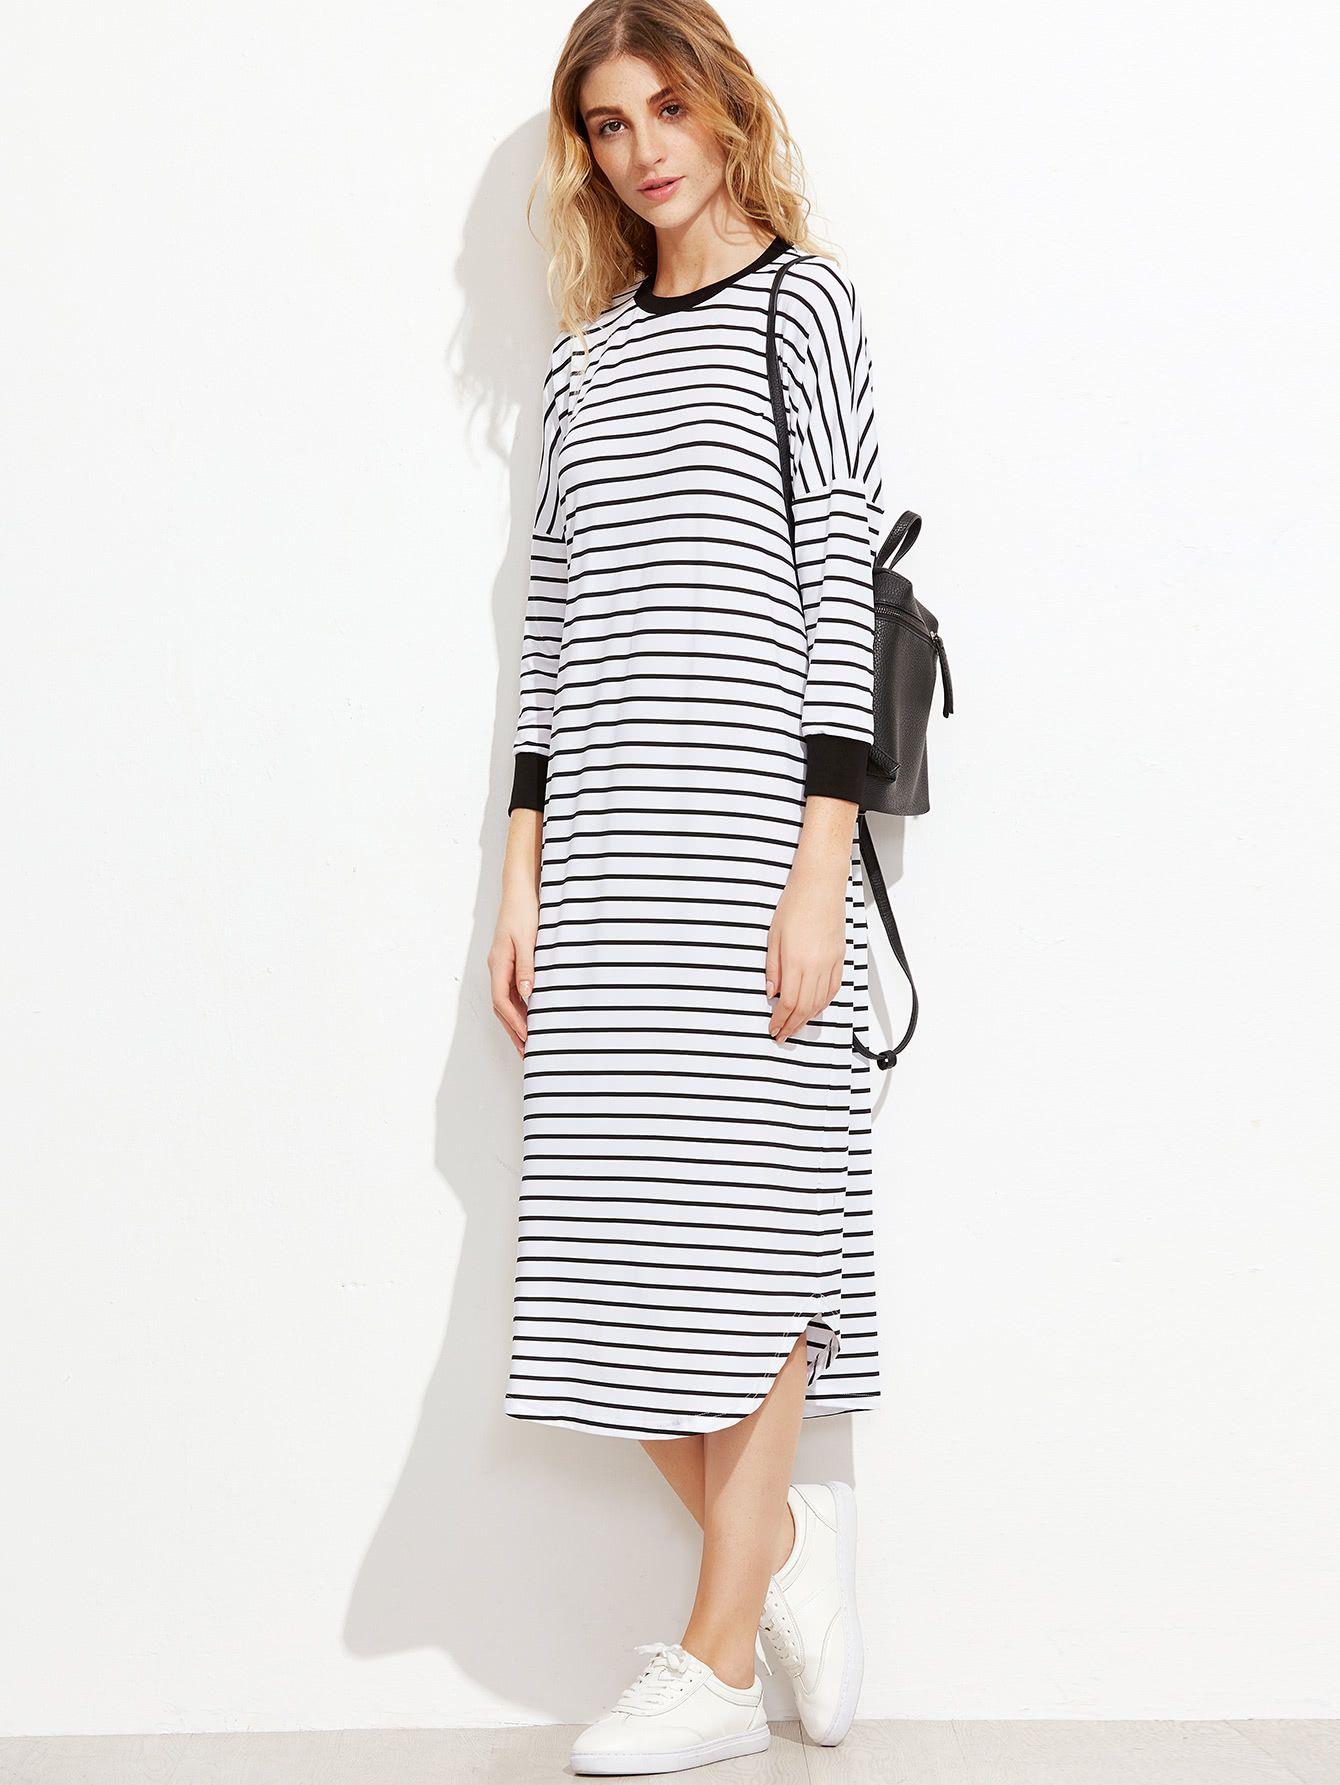 b627e8b35b7f Shop Striped Contrast Trim Drop Shoulder Tee Dress online. SheIn offers  Striped Contrast Trim Drop Shoulder Tee Dress   more to fit your  fashionable needs.